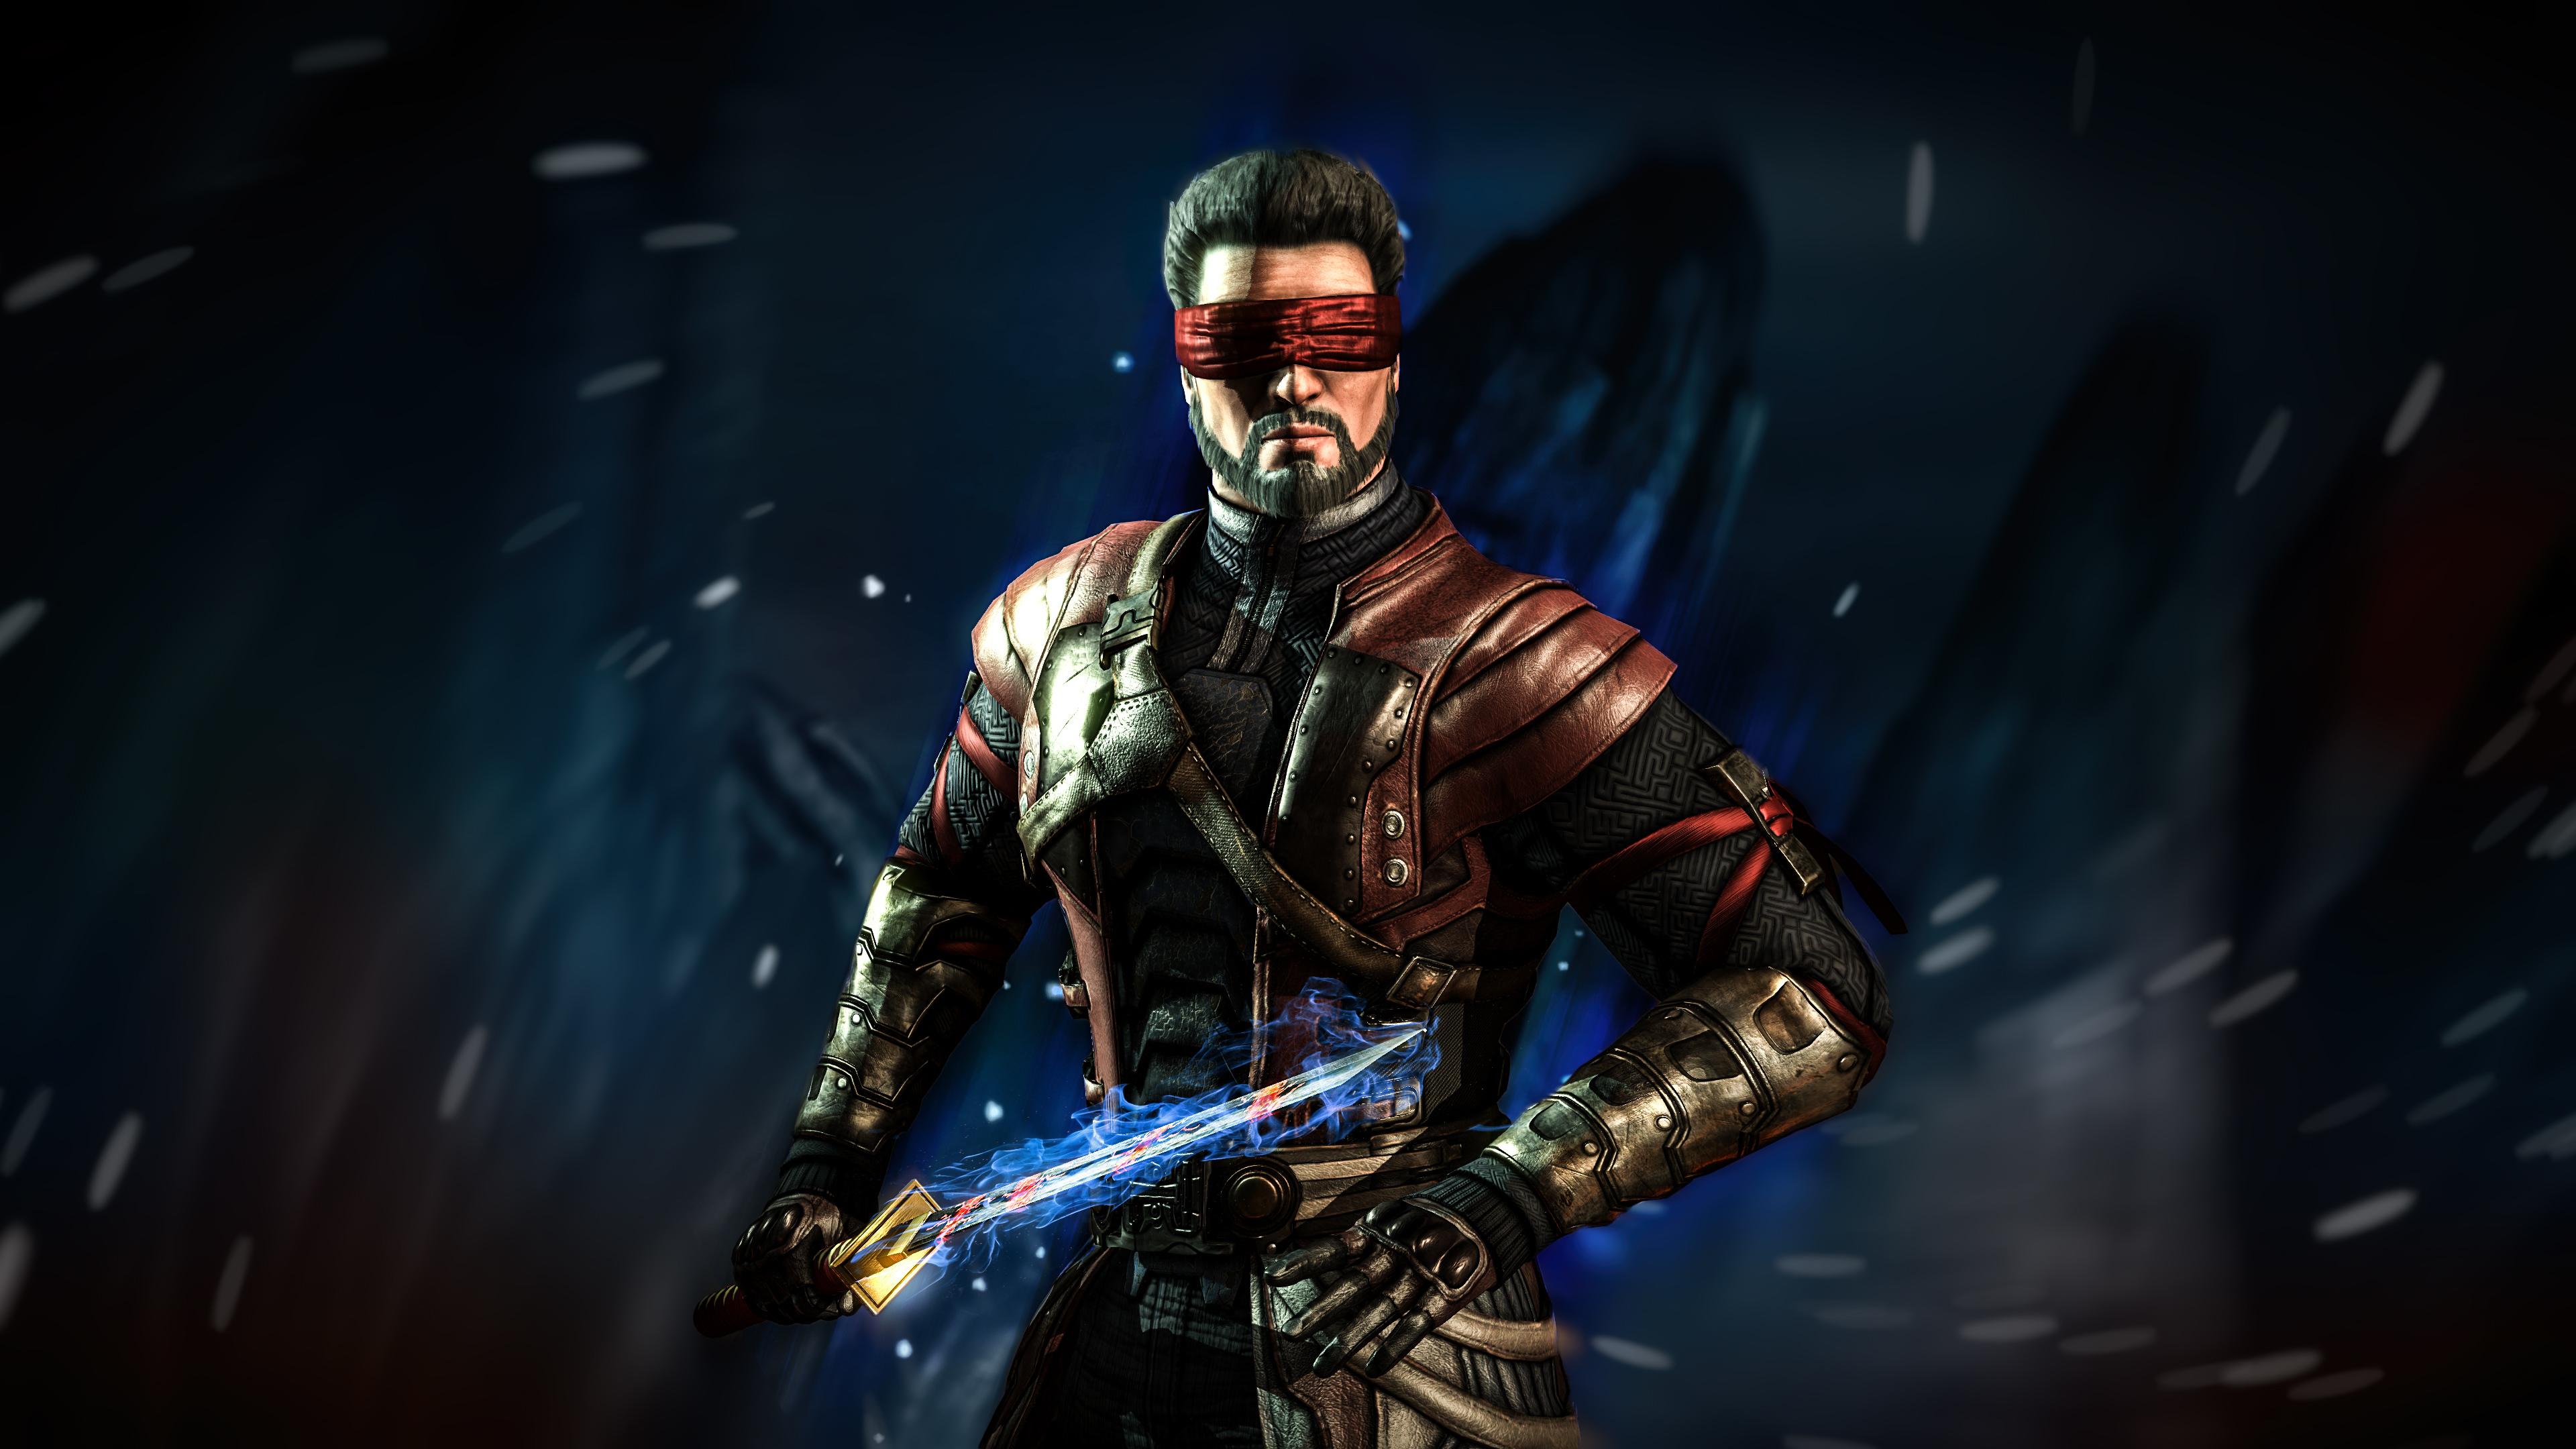 Mortal Kombat X New Game Wallpaper Hd Games 4k Wallpapers Images